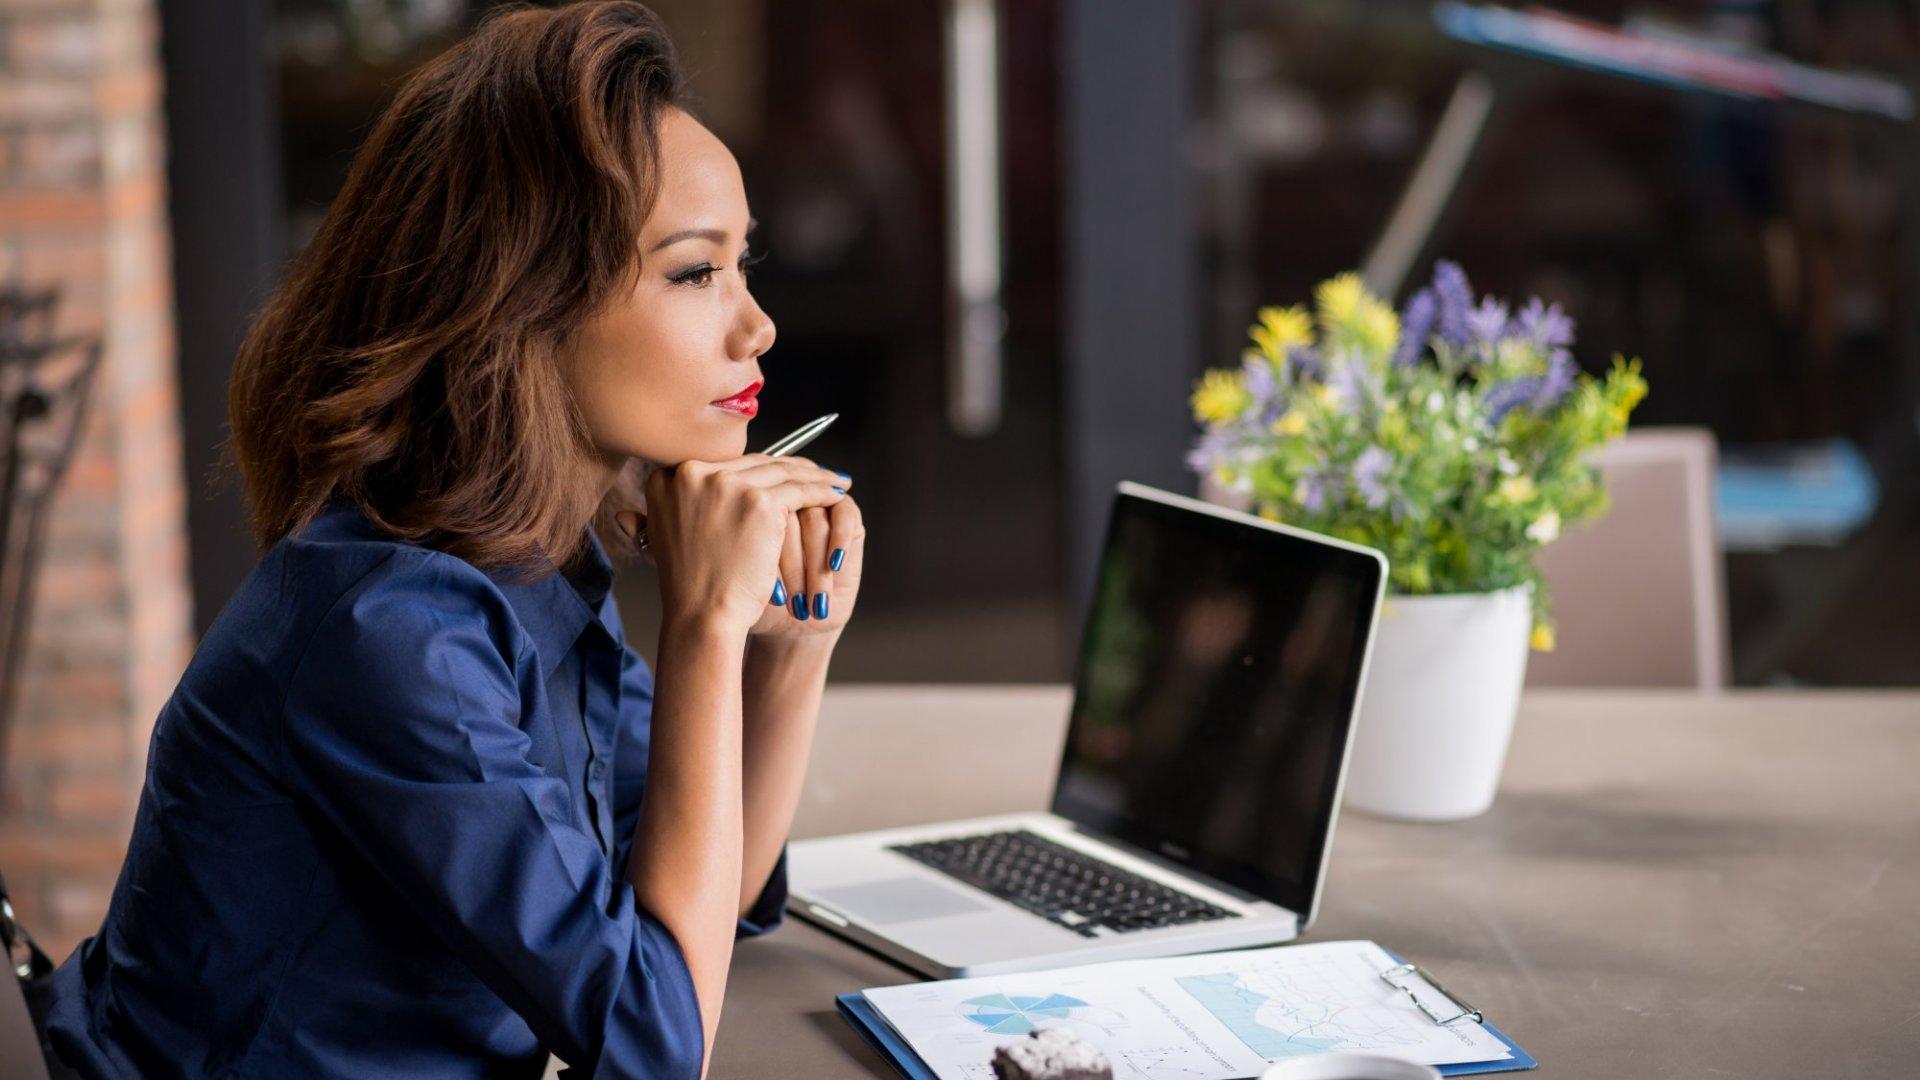 3 Common Entrepreneurial Habits That Are Hard to Break